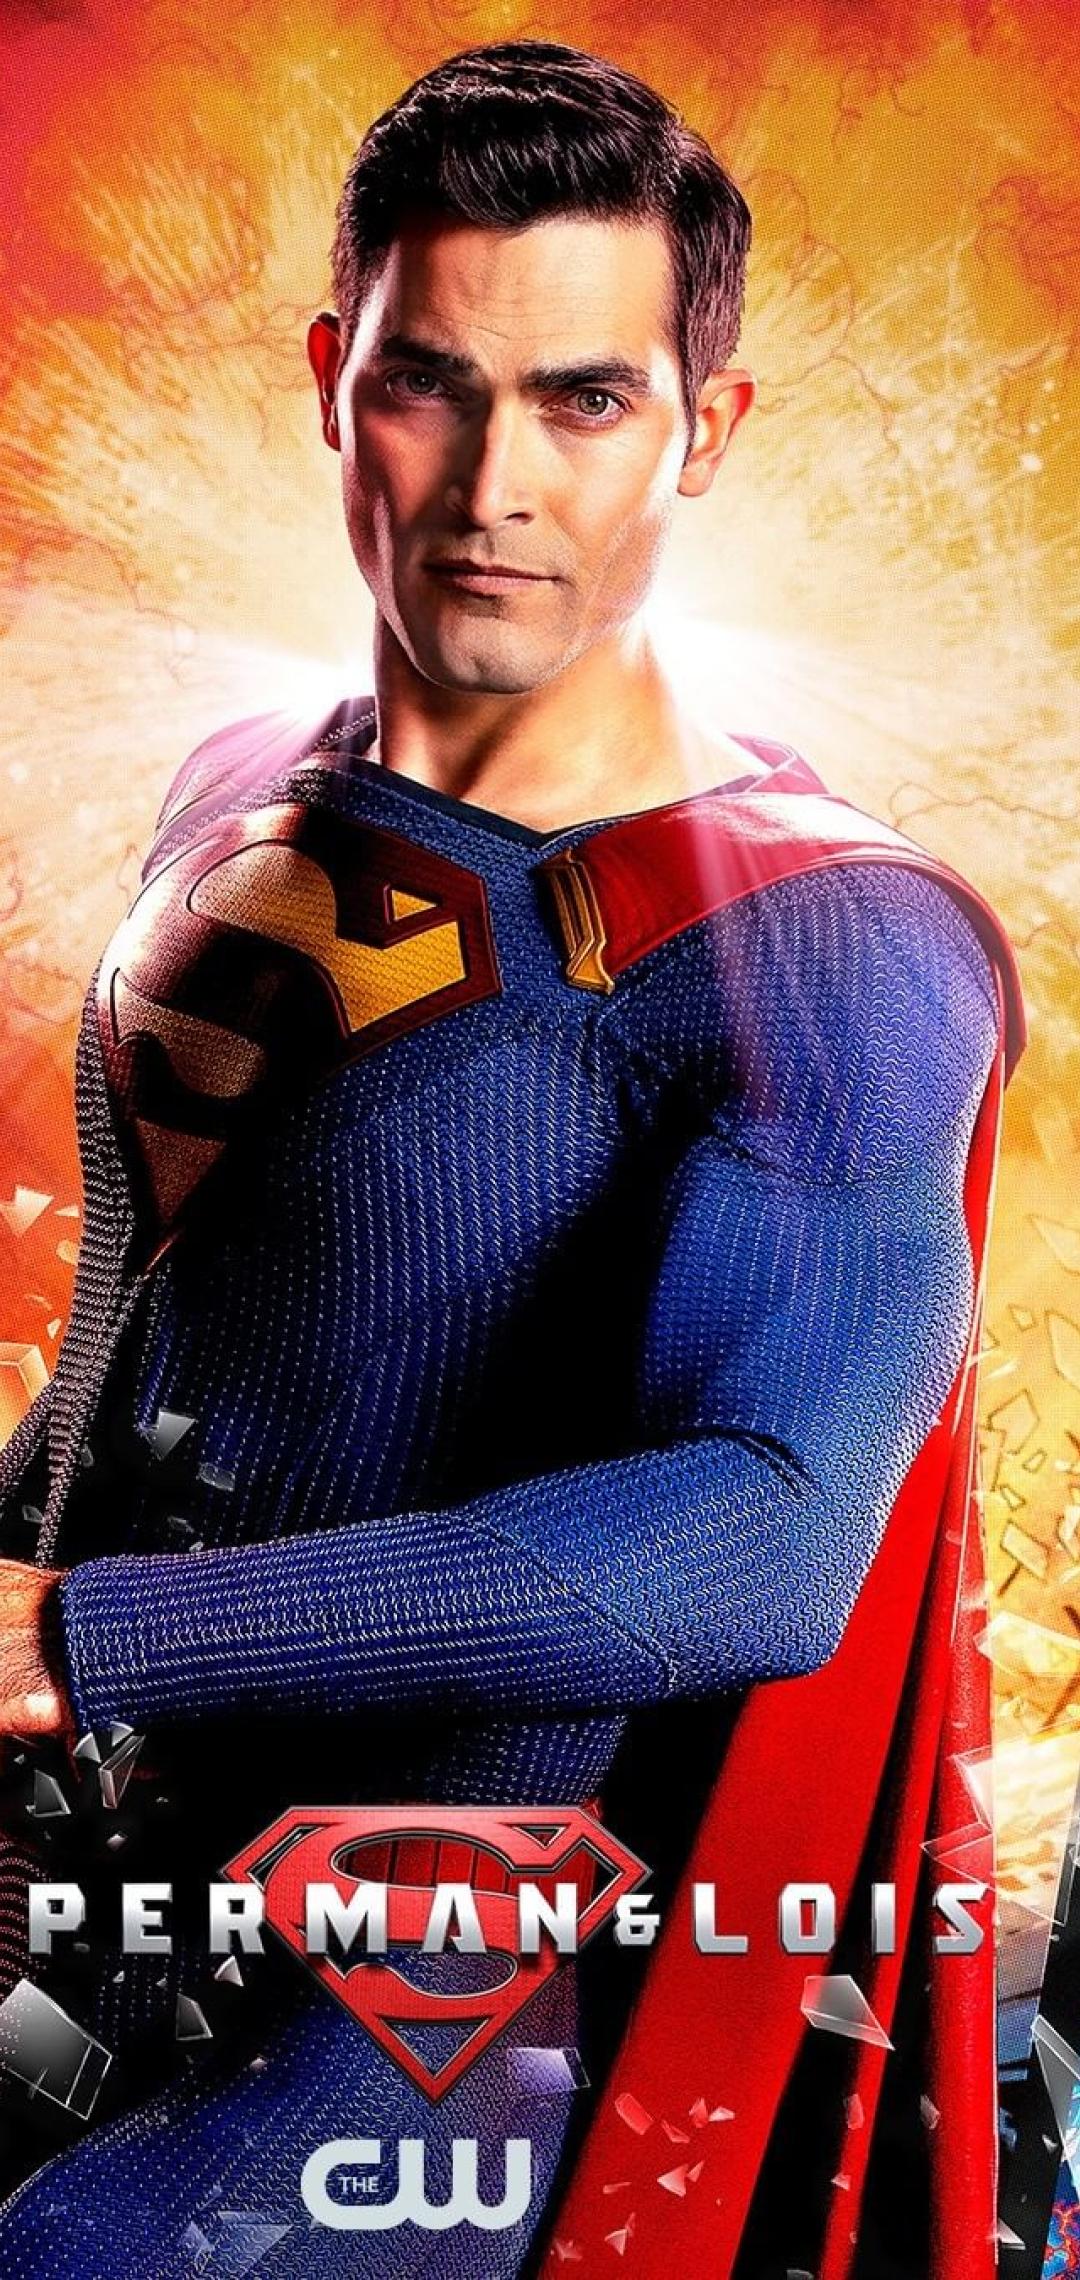 Superman Arrowverse Wallpaper in 1080x2280 Resolution